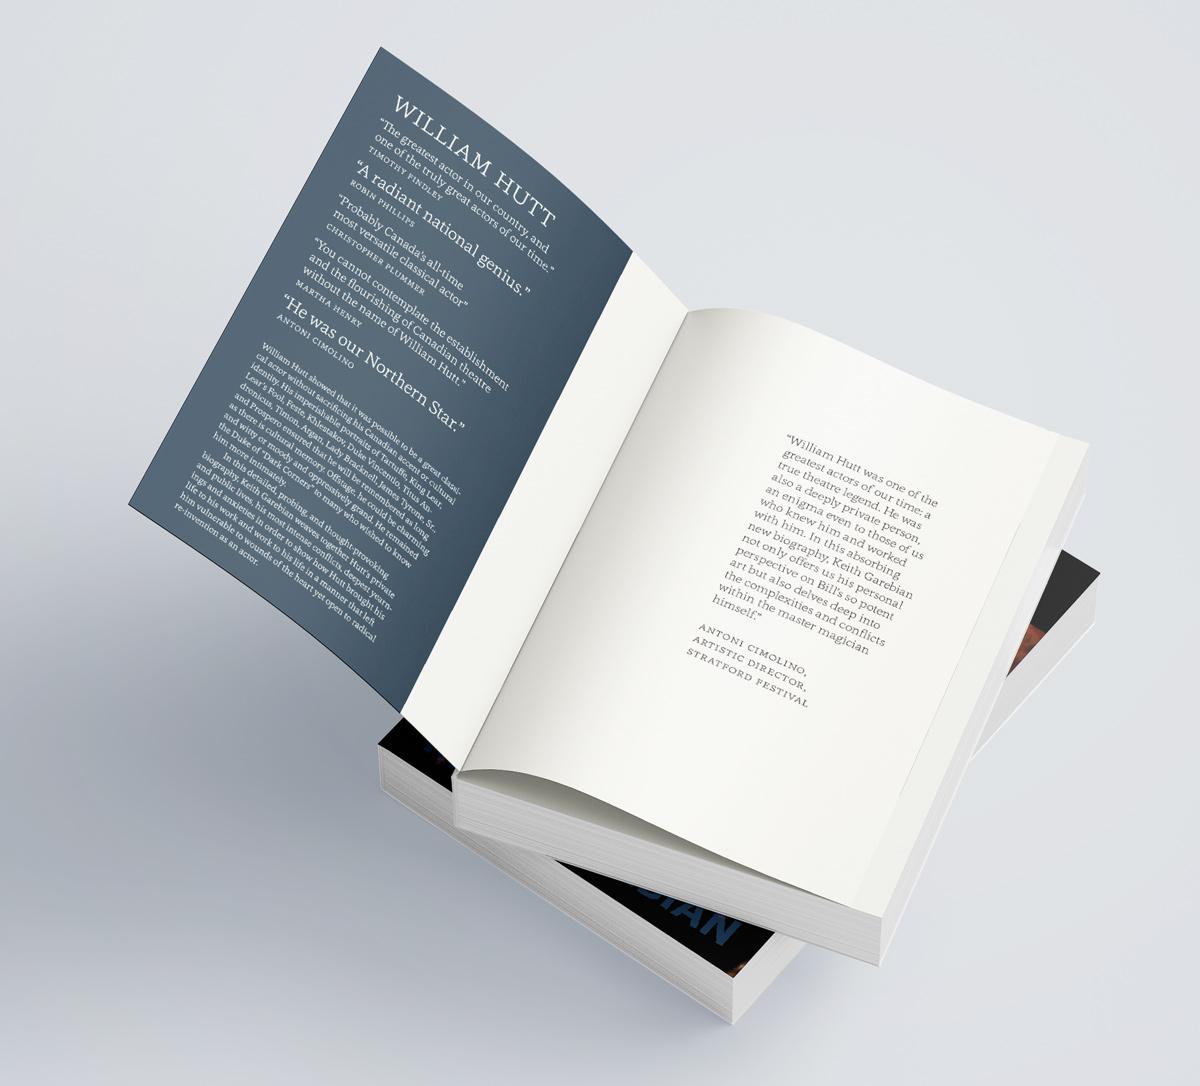 BOOKS-Hutt-insidecover